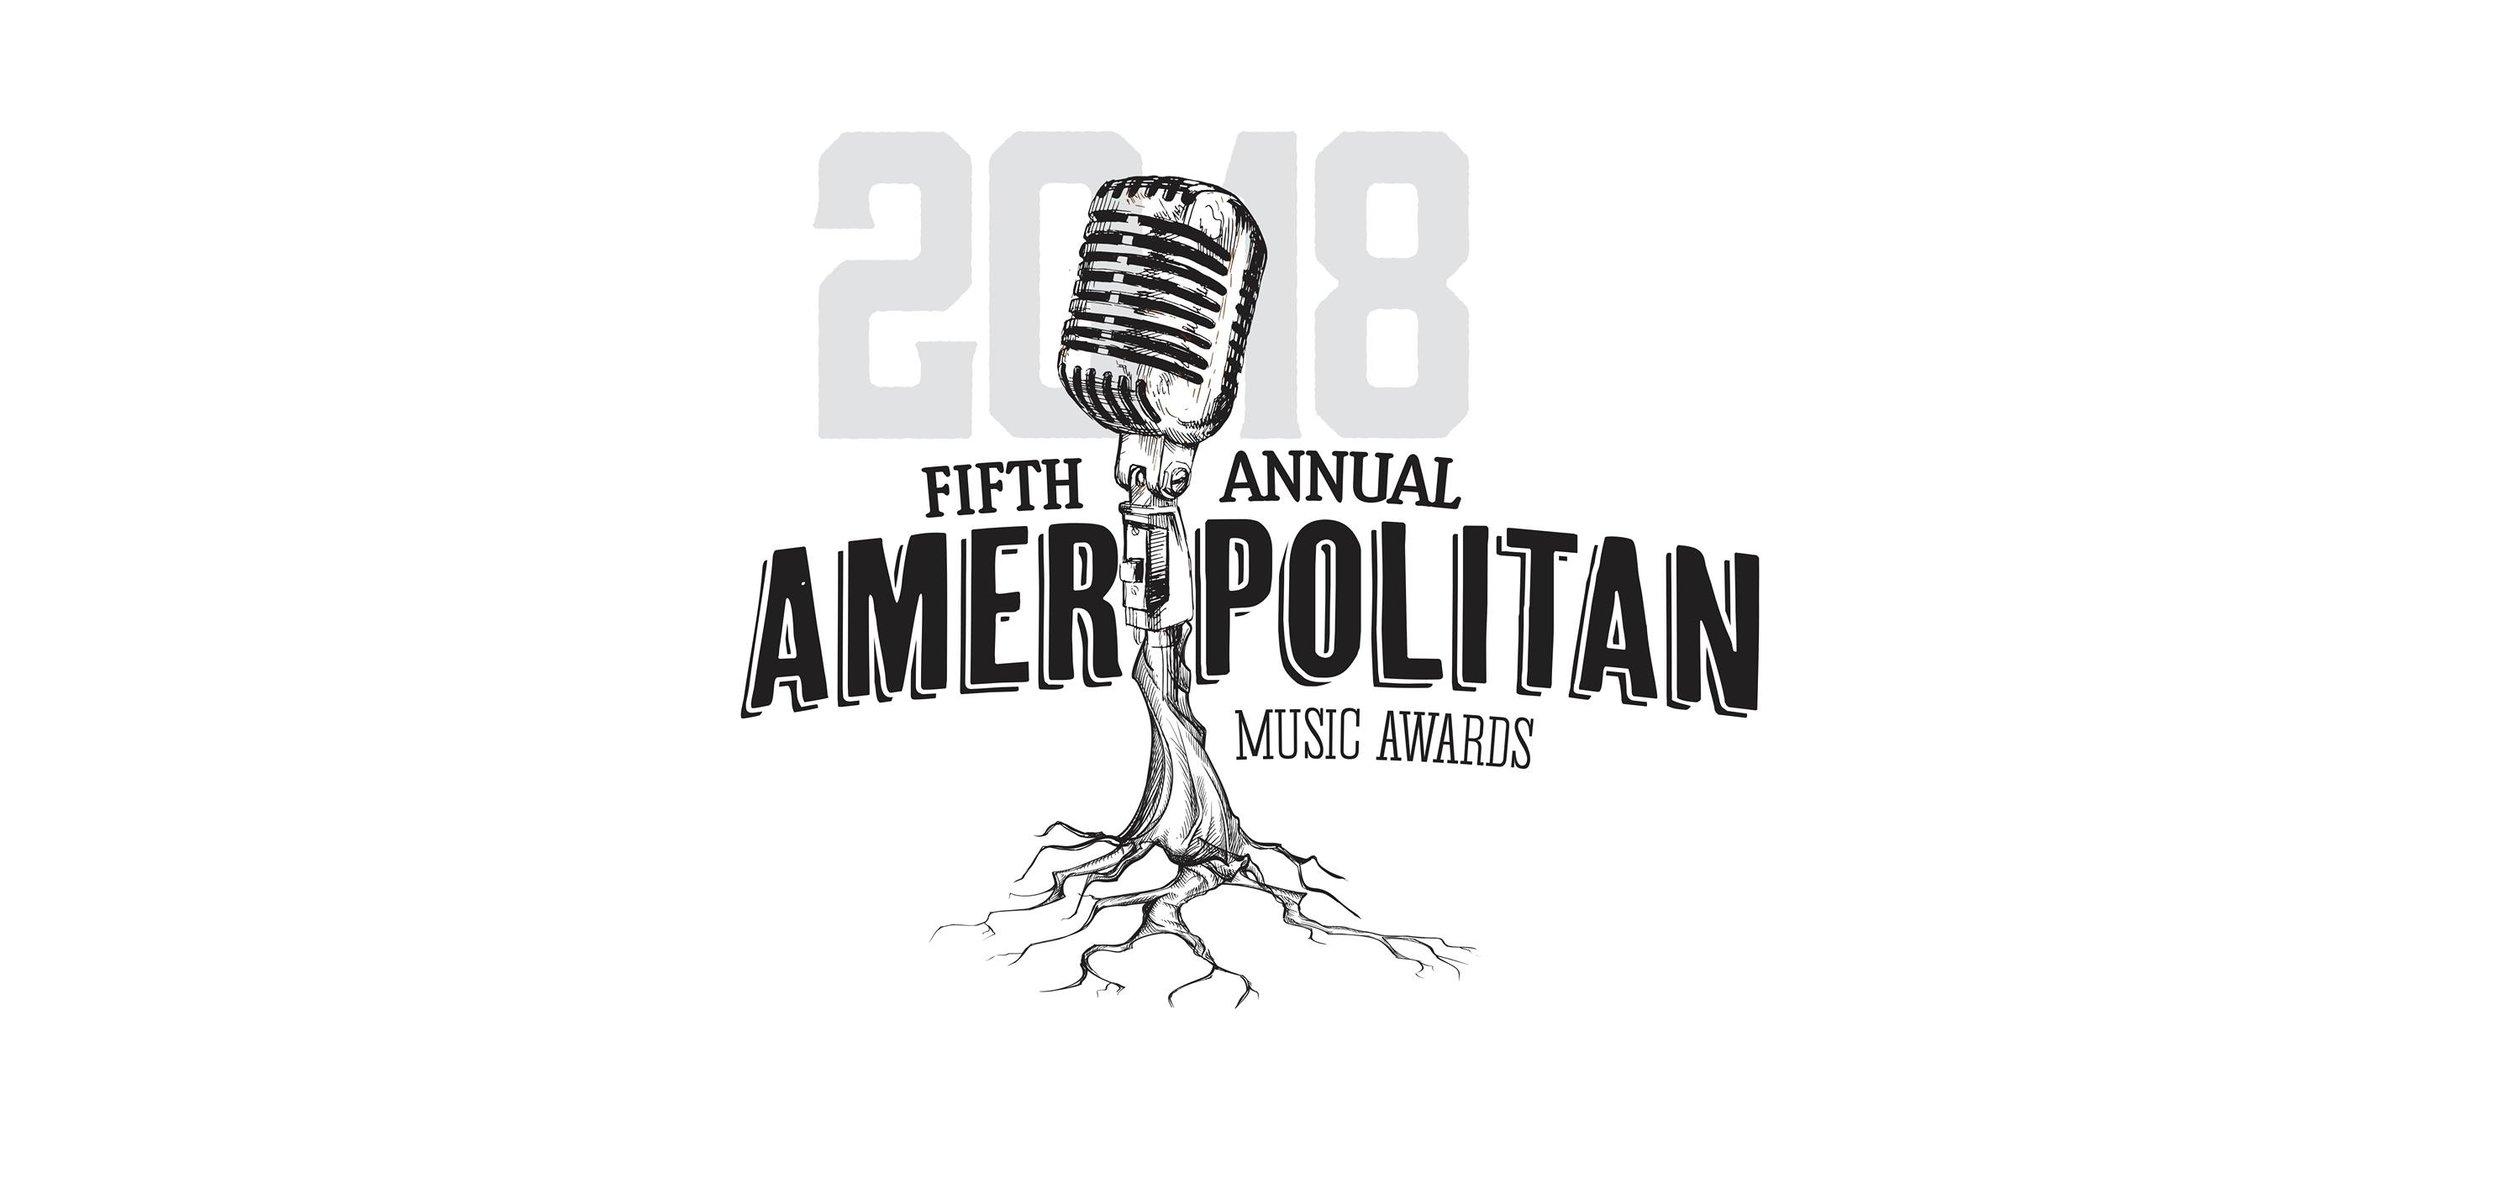 ameripolitan logo 2018.jpg